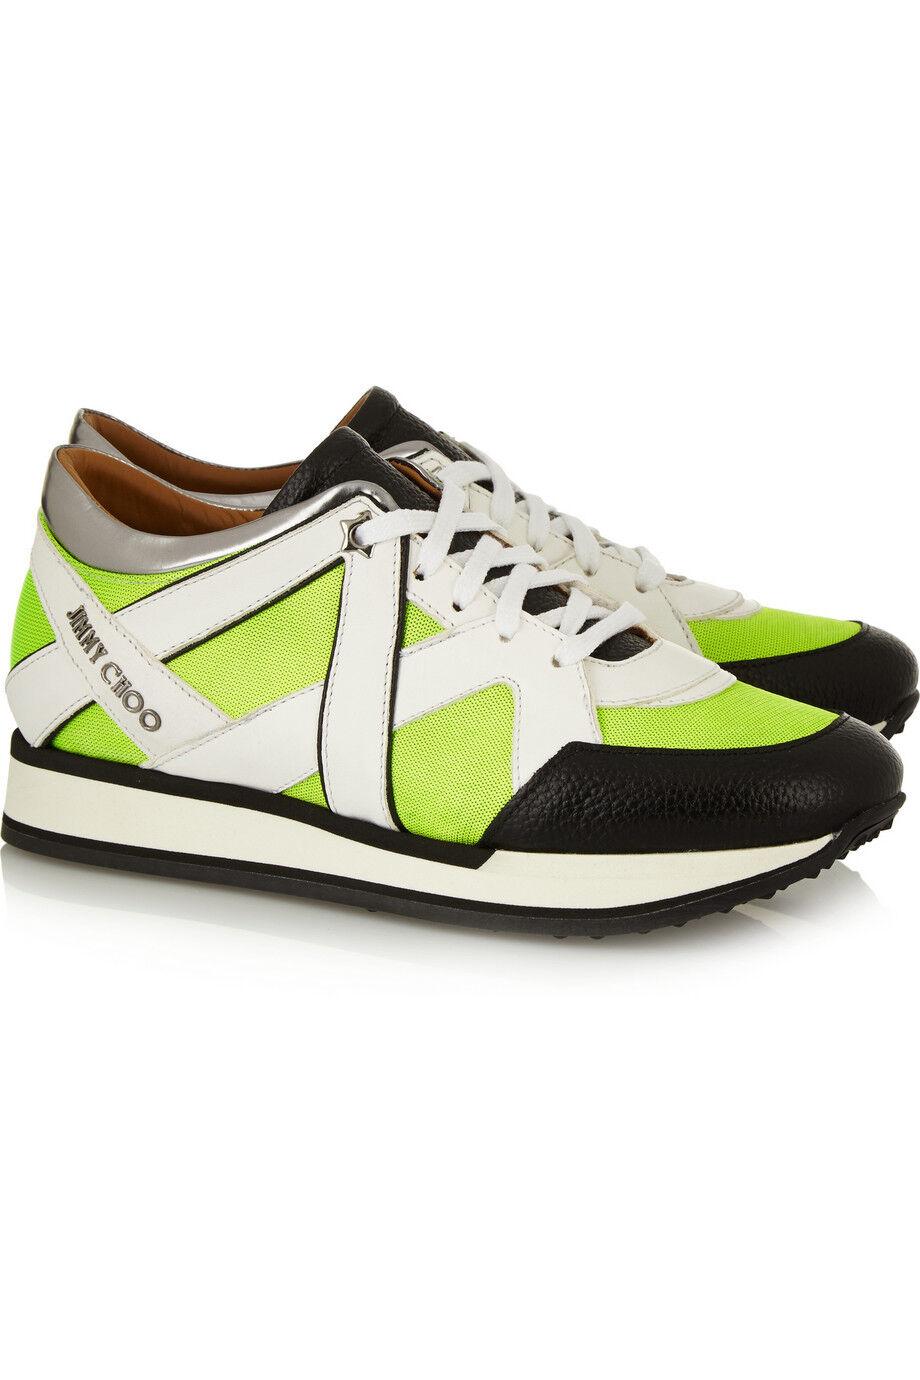 Jimmy Choo Yellow Lime London Neon Mesh And Leather Scarpe da Ginnastica Flat Shoe 36.5- 6